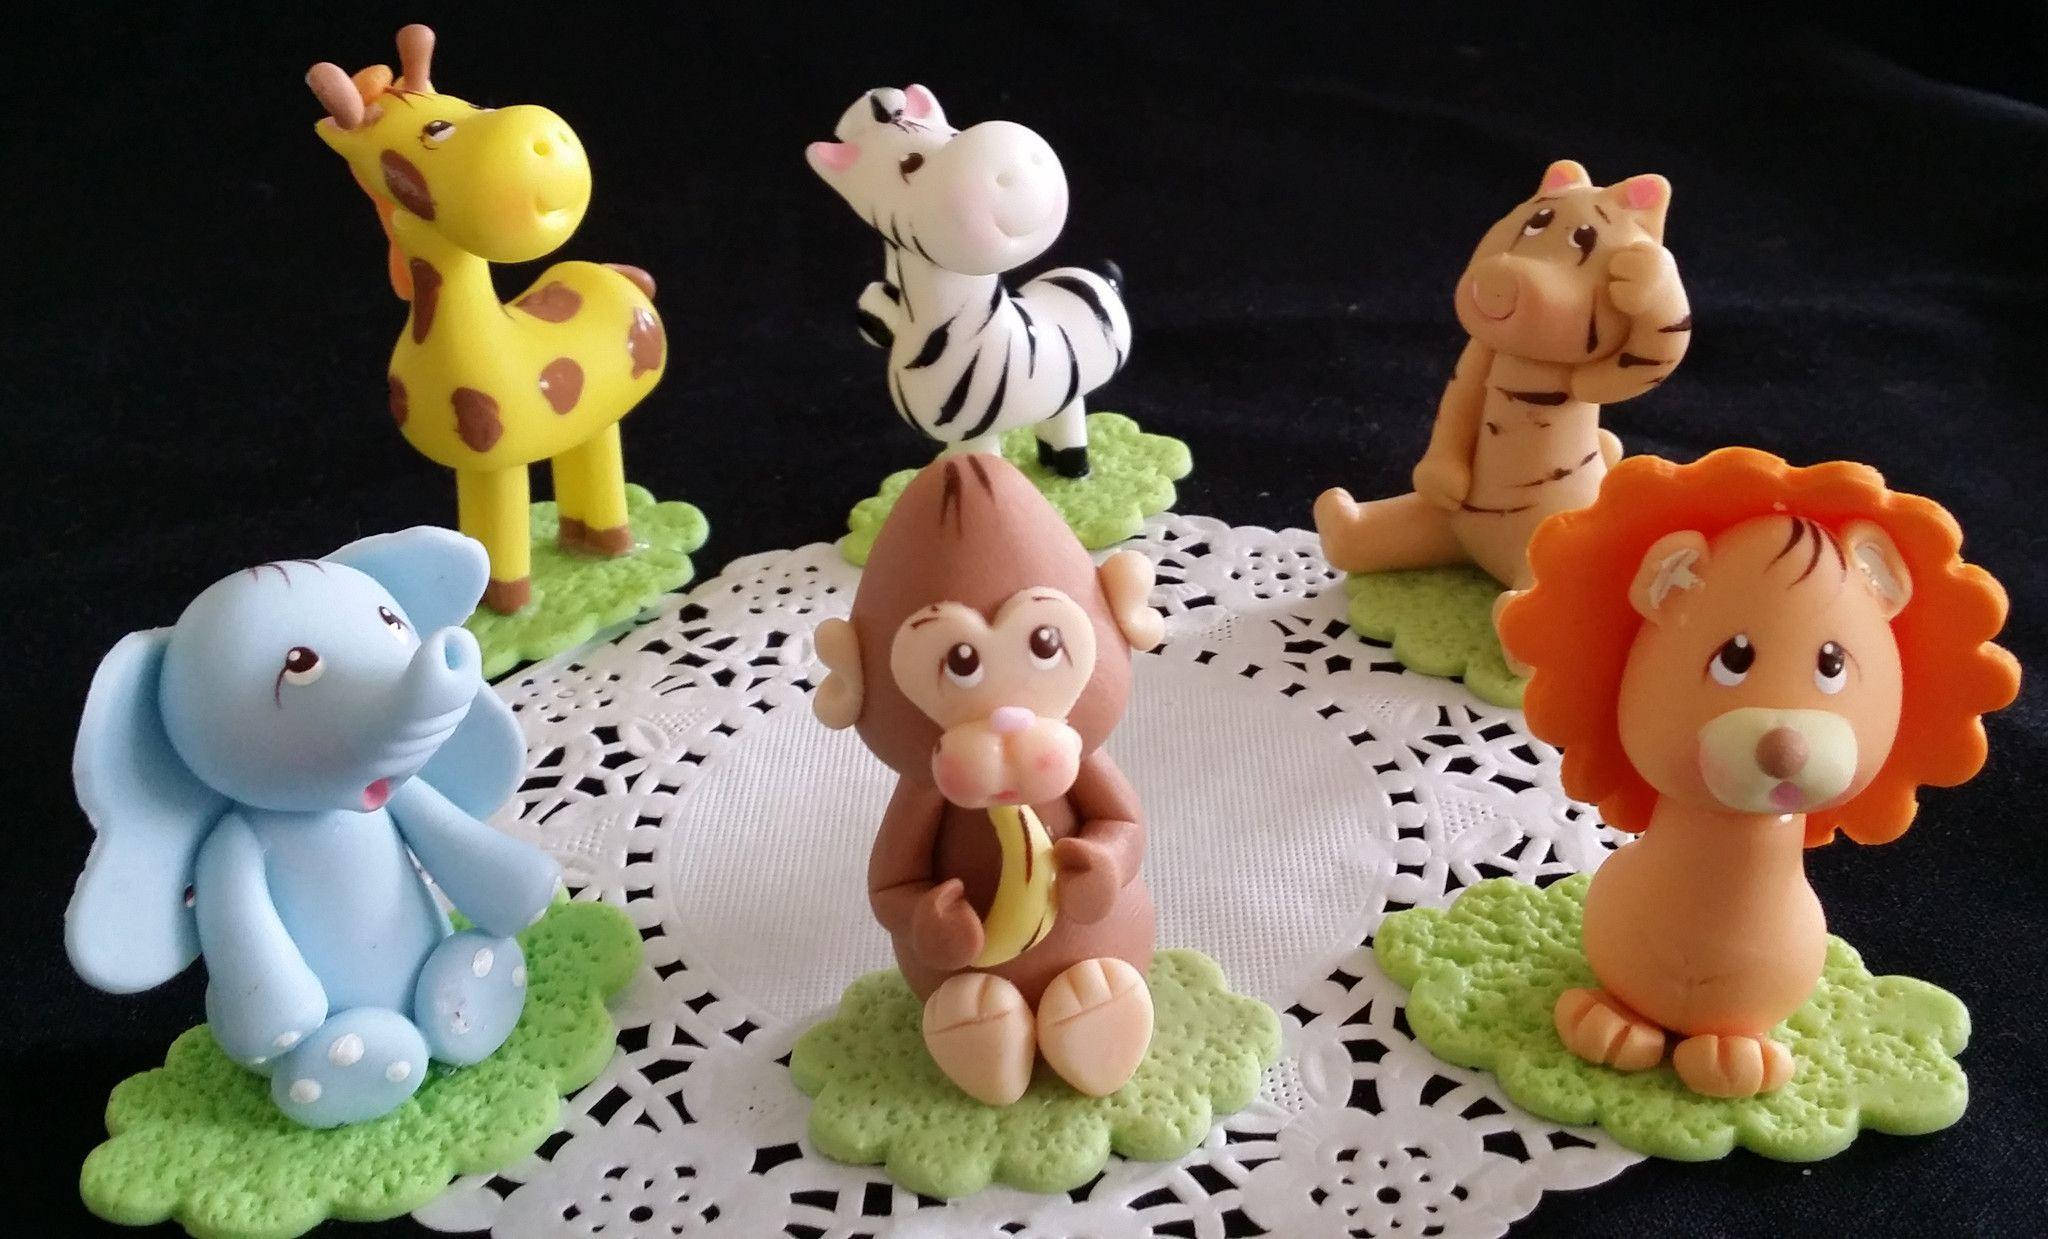 LION GIRAFFE MONKEY ELEPHANT NOAH/'S ARK CAKE TOPPER EDIBLE  JUNGLE ANIMALS